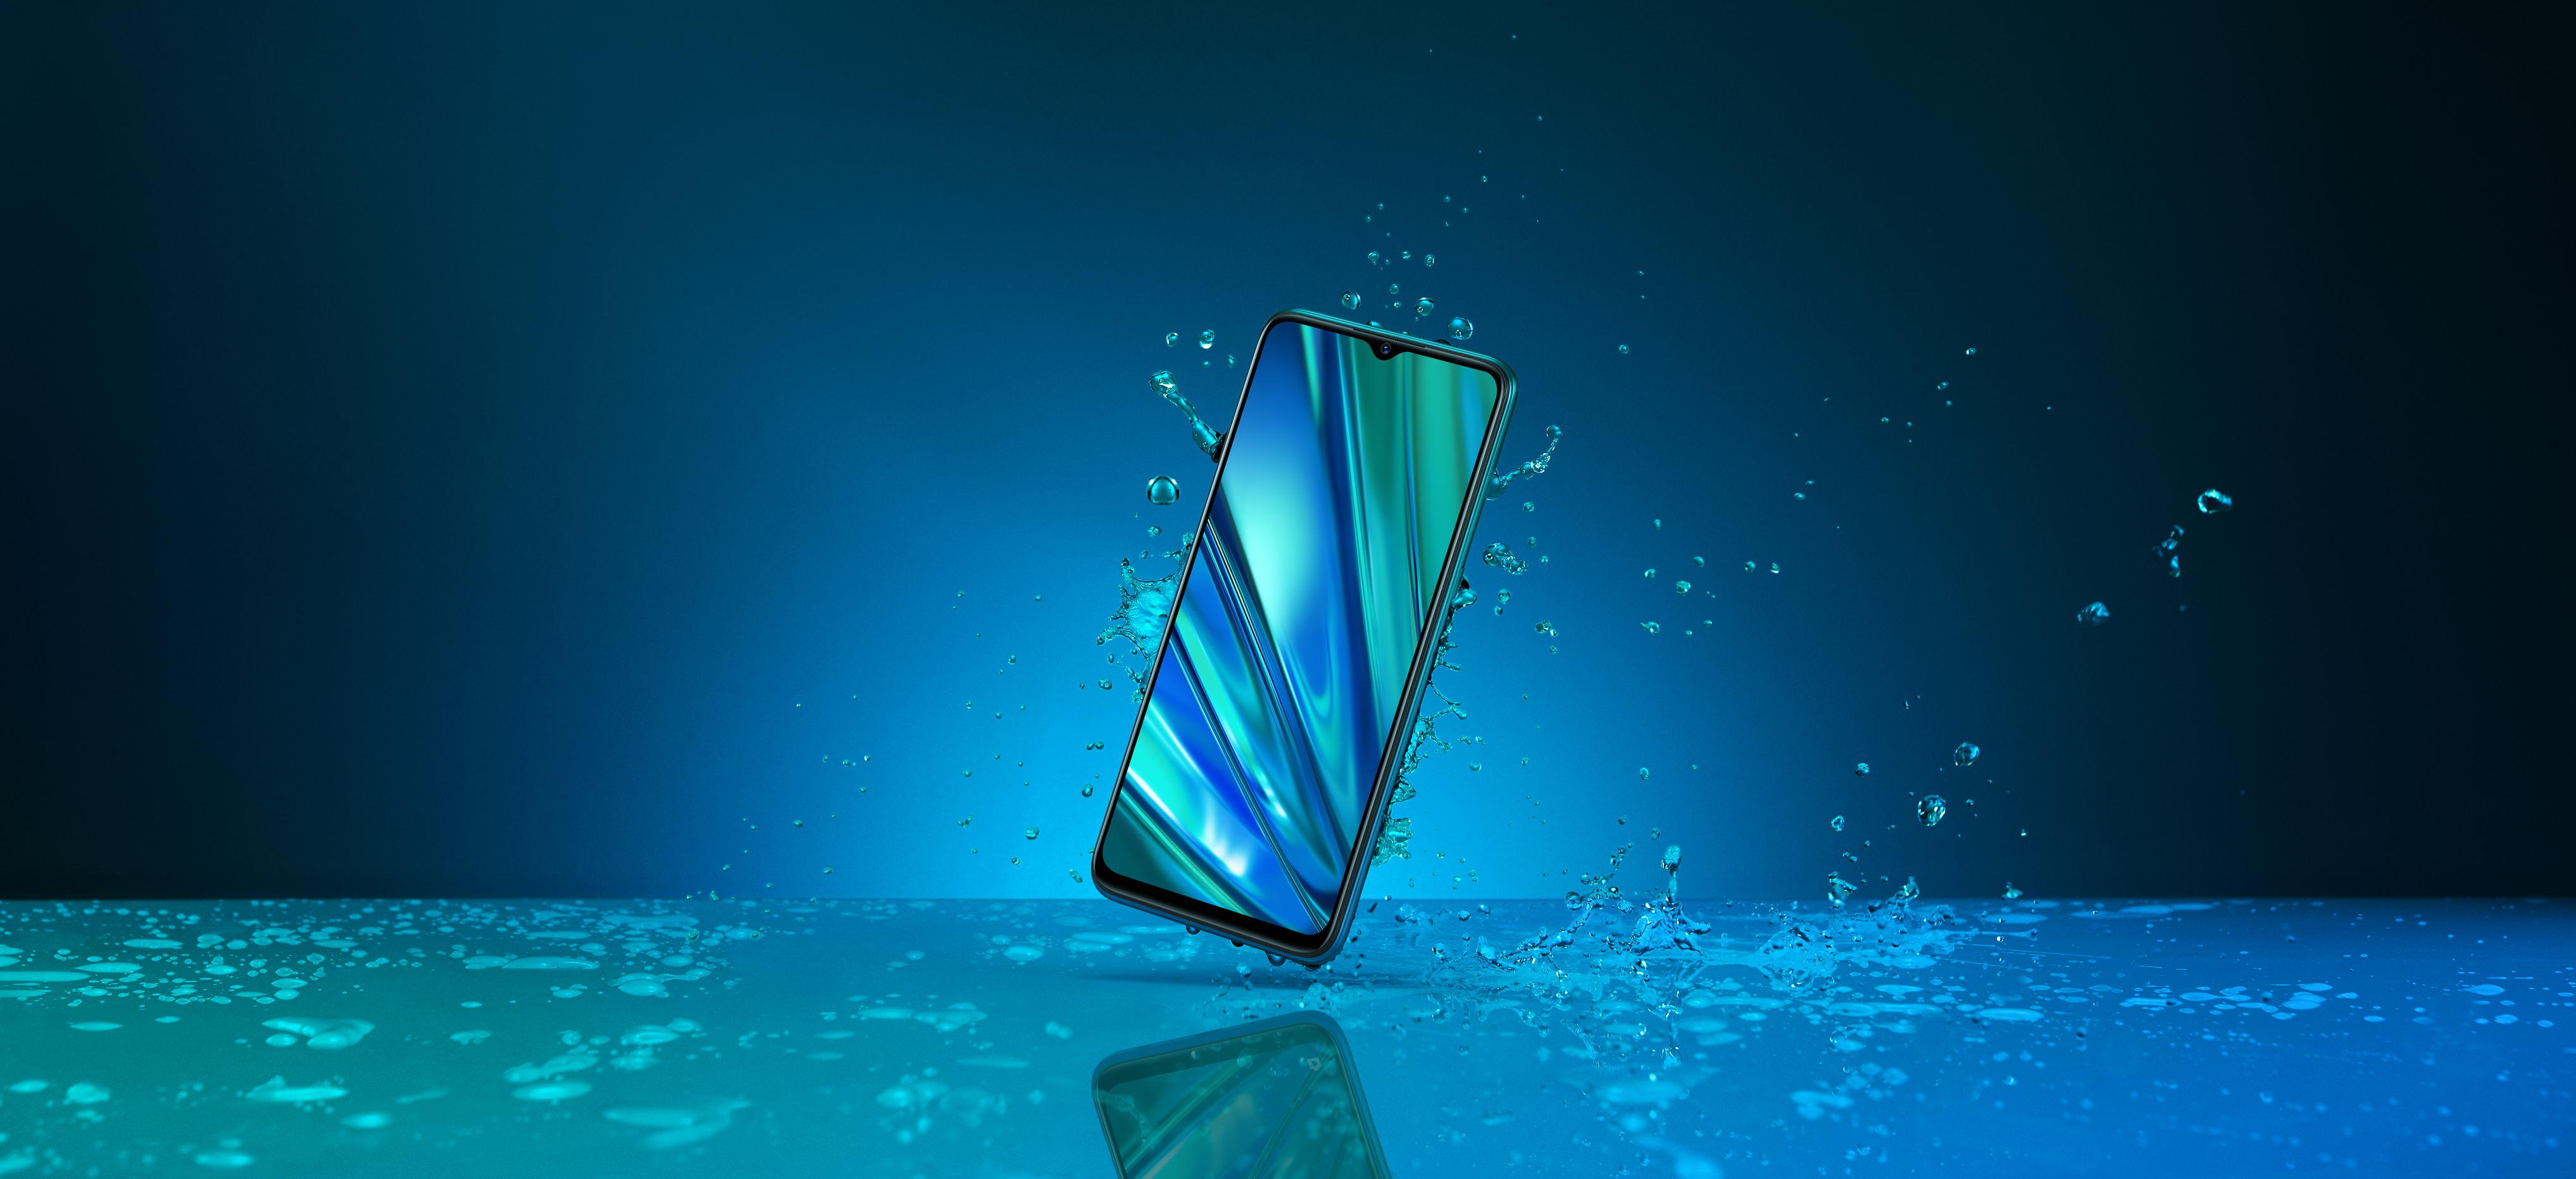 Realme 5 Pro has Splash-Proof Design